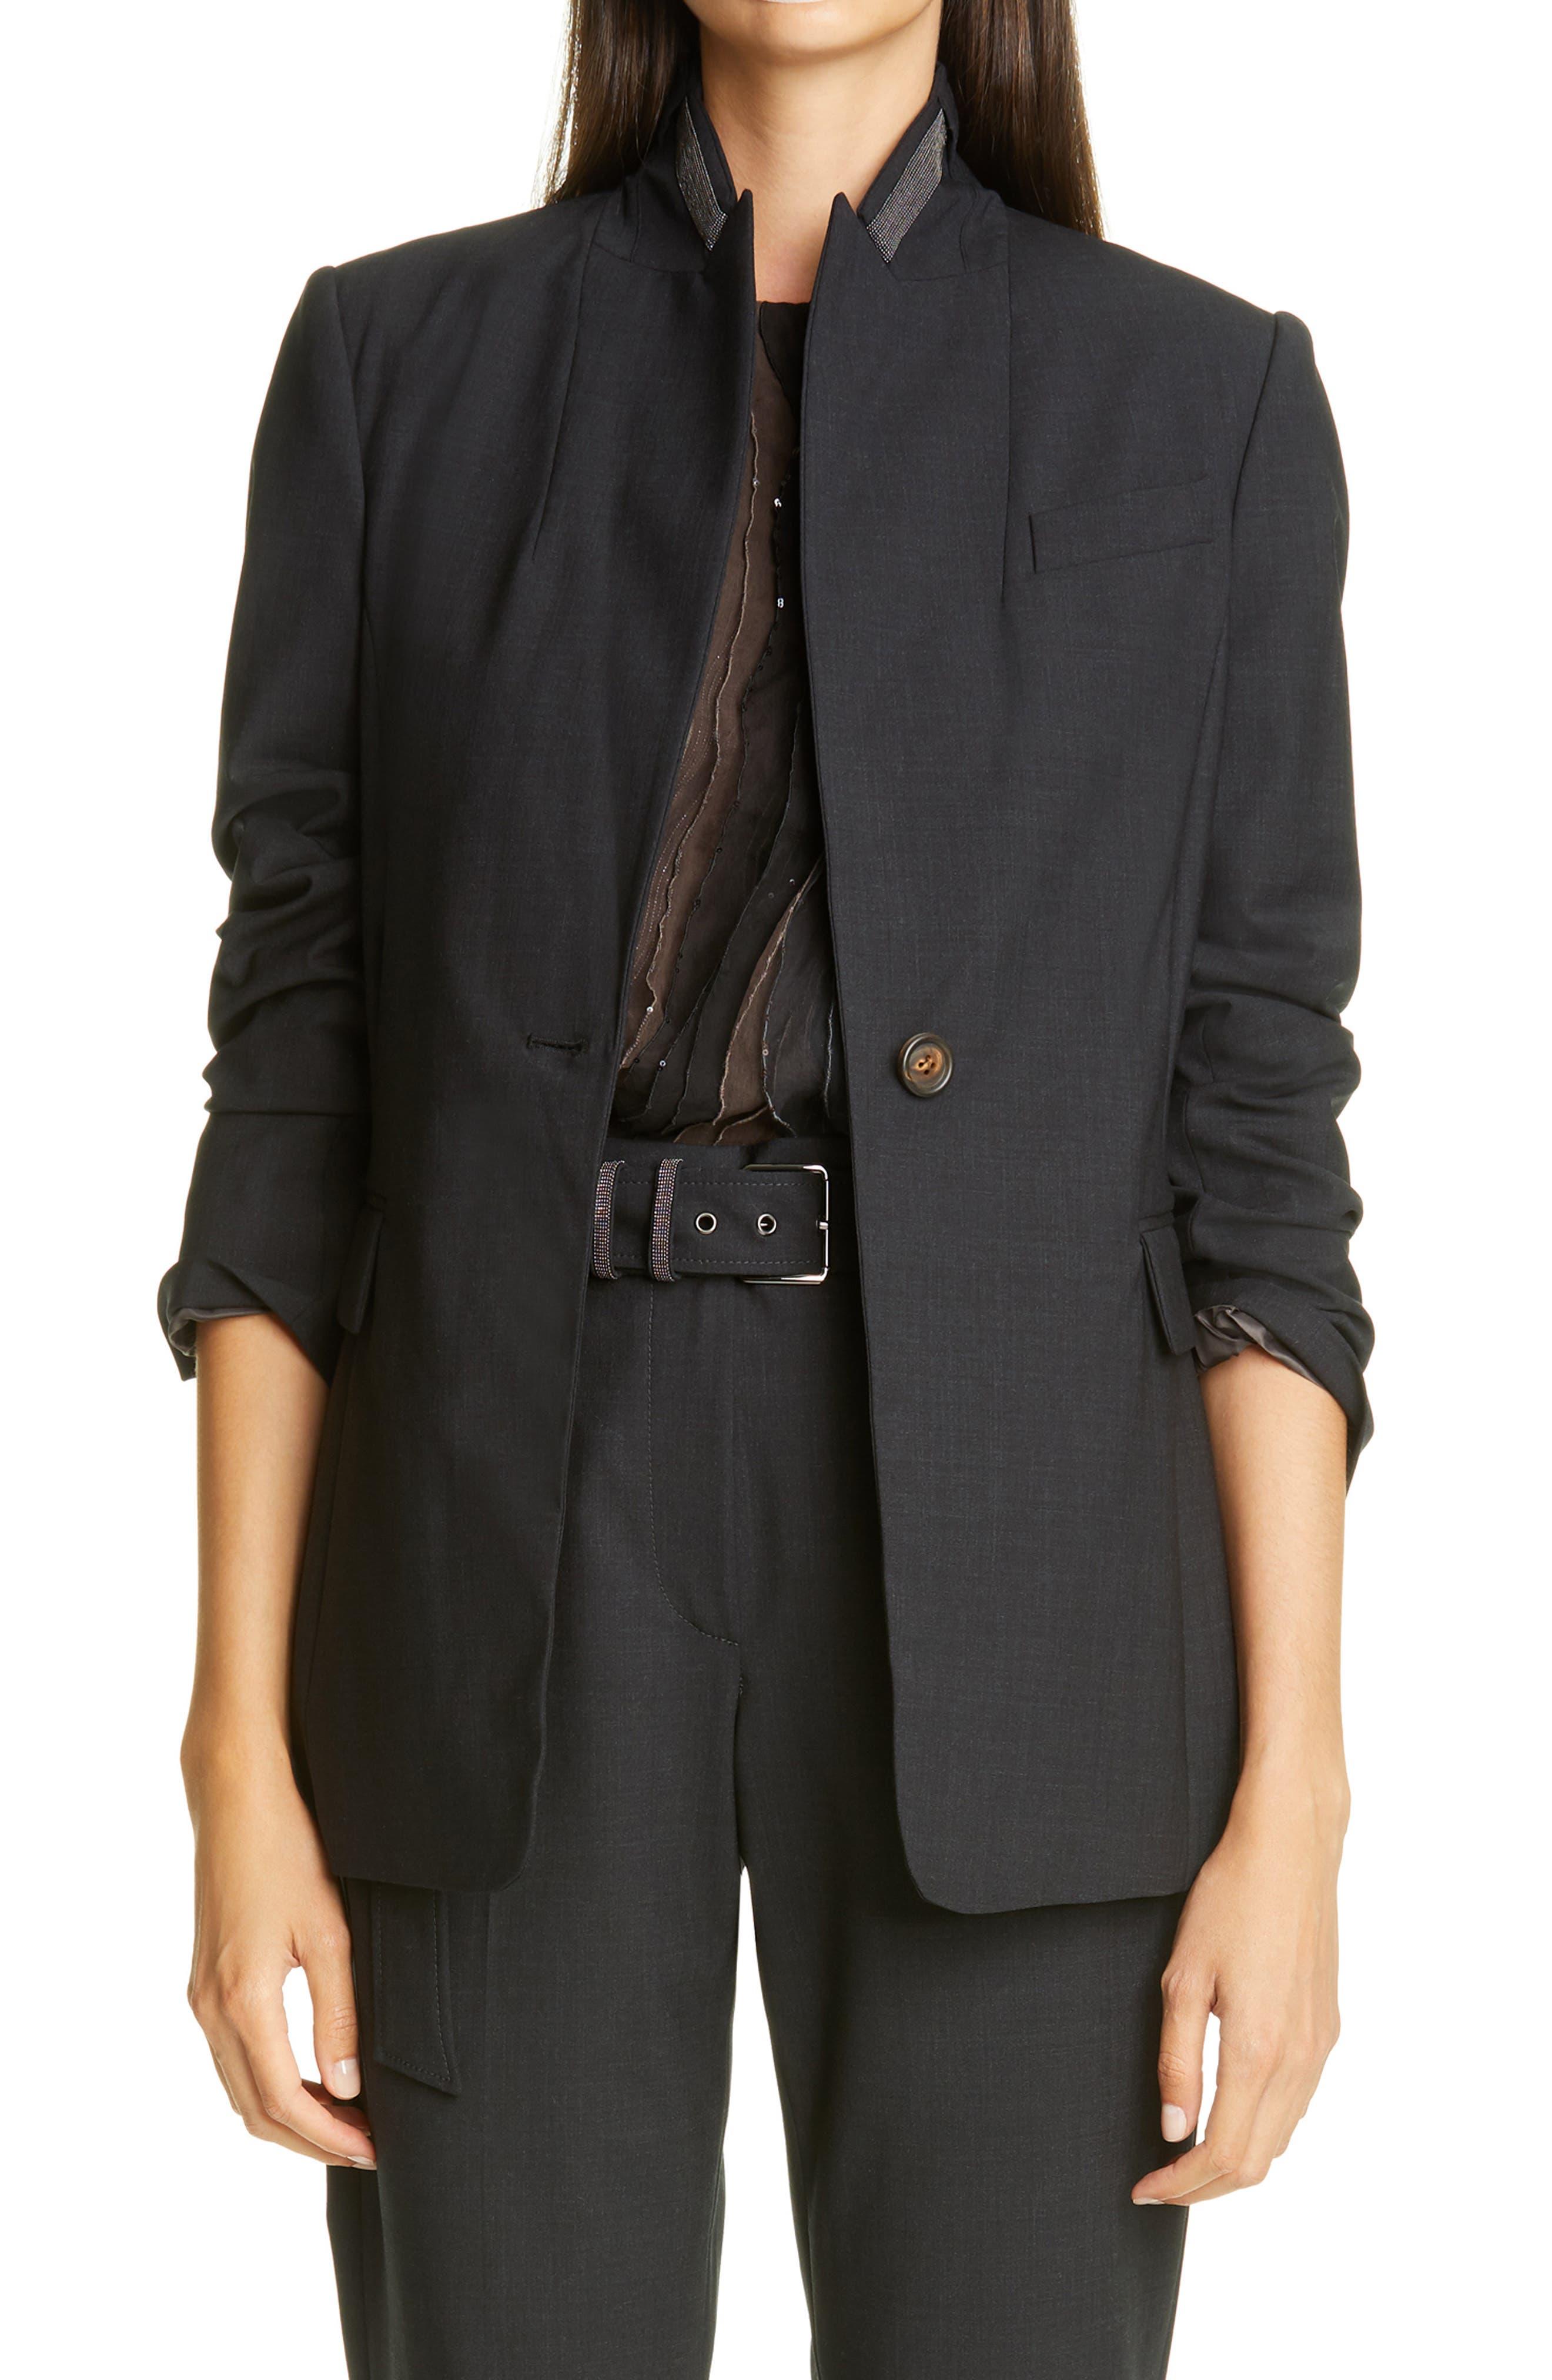 Image of Brunello Cucinelli Monili Stand Collar Wool Blend Jacket